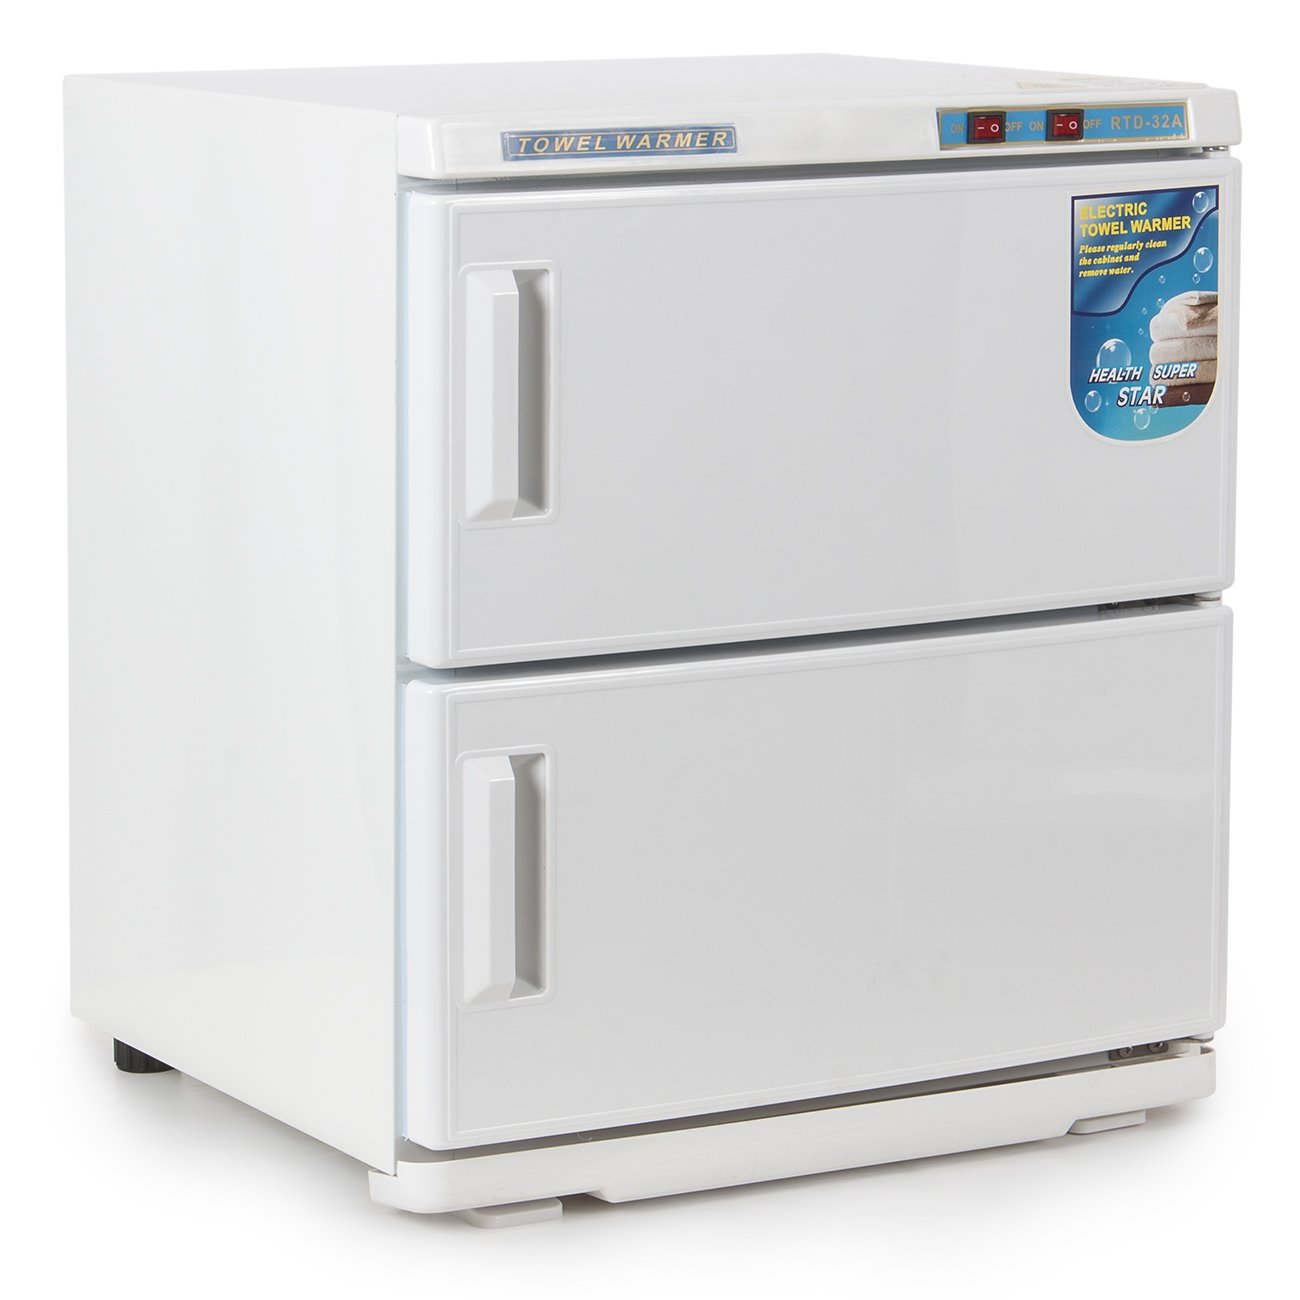 Bellavie 2-in-1 Electric Towel Warmer & Ultraviolet Sterilizer Cabinet Beauty Salon Equipment, 2 Cabinet, 32L